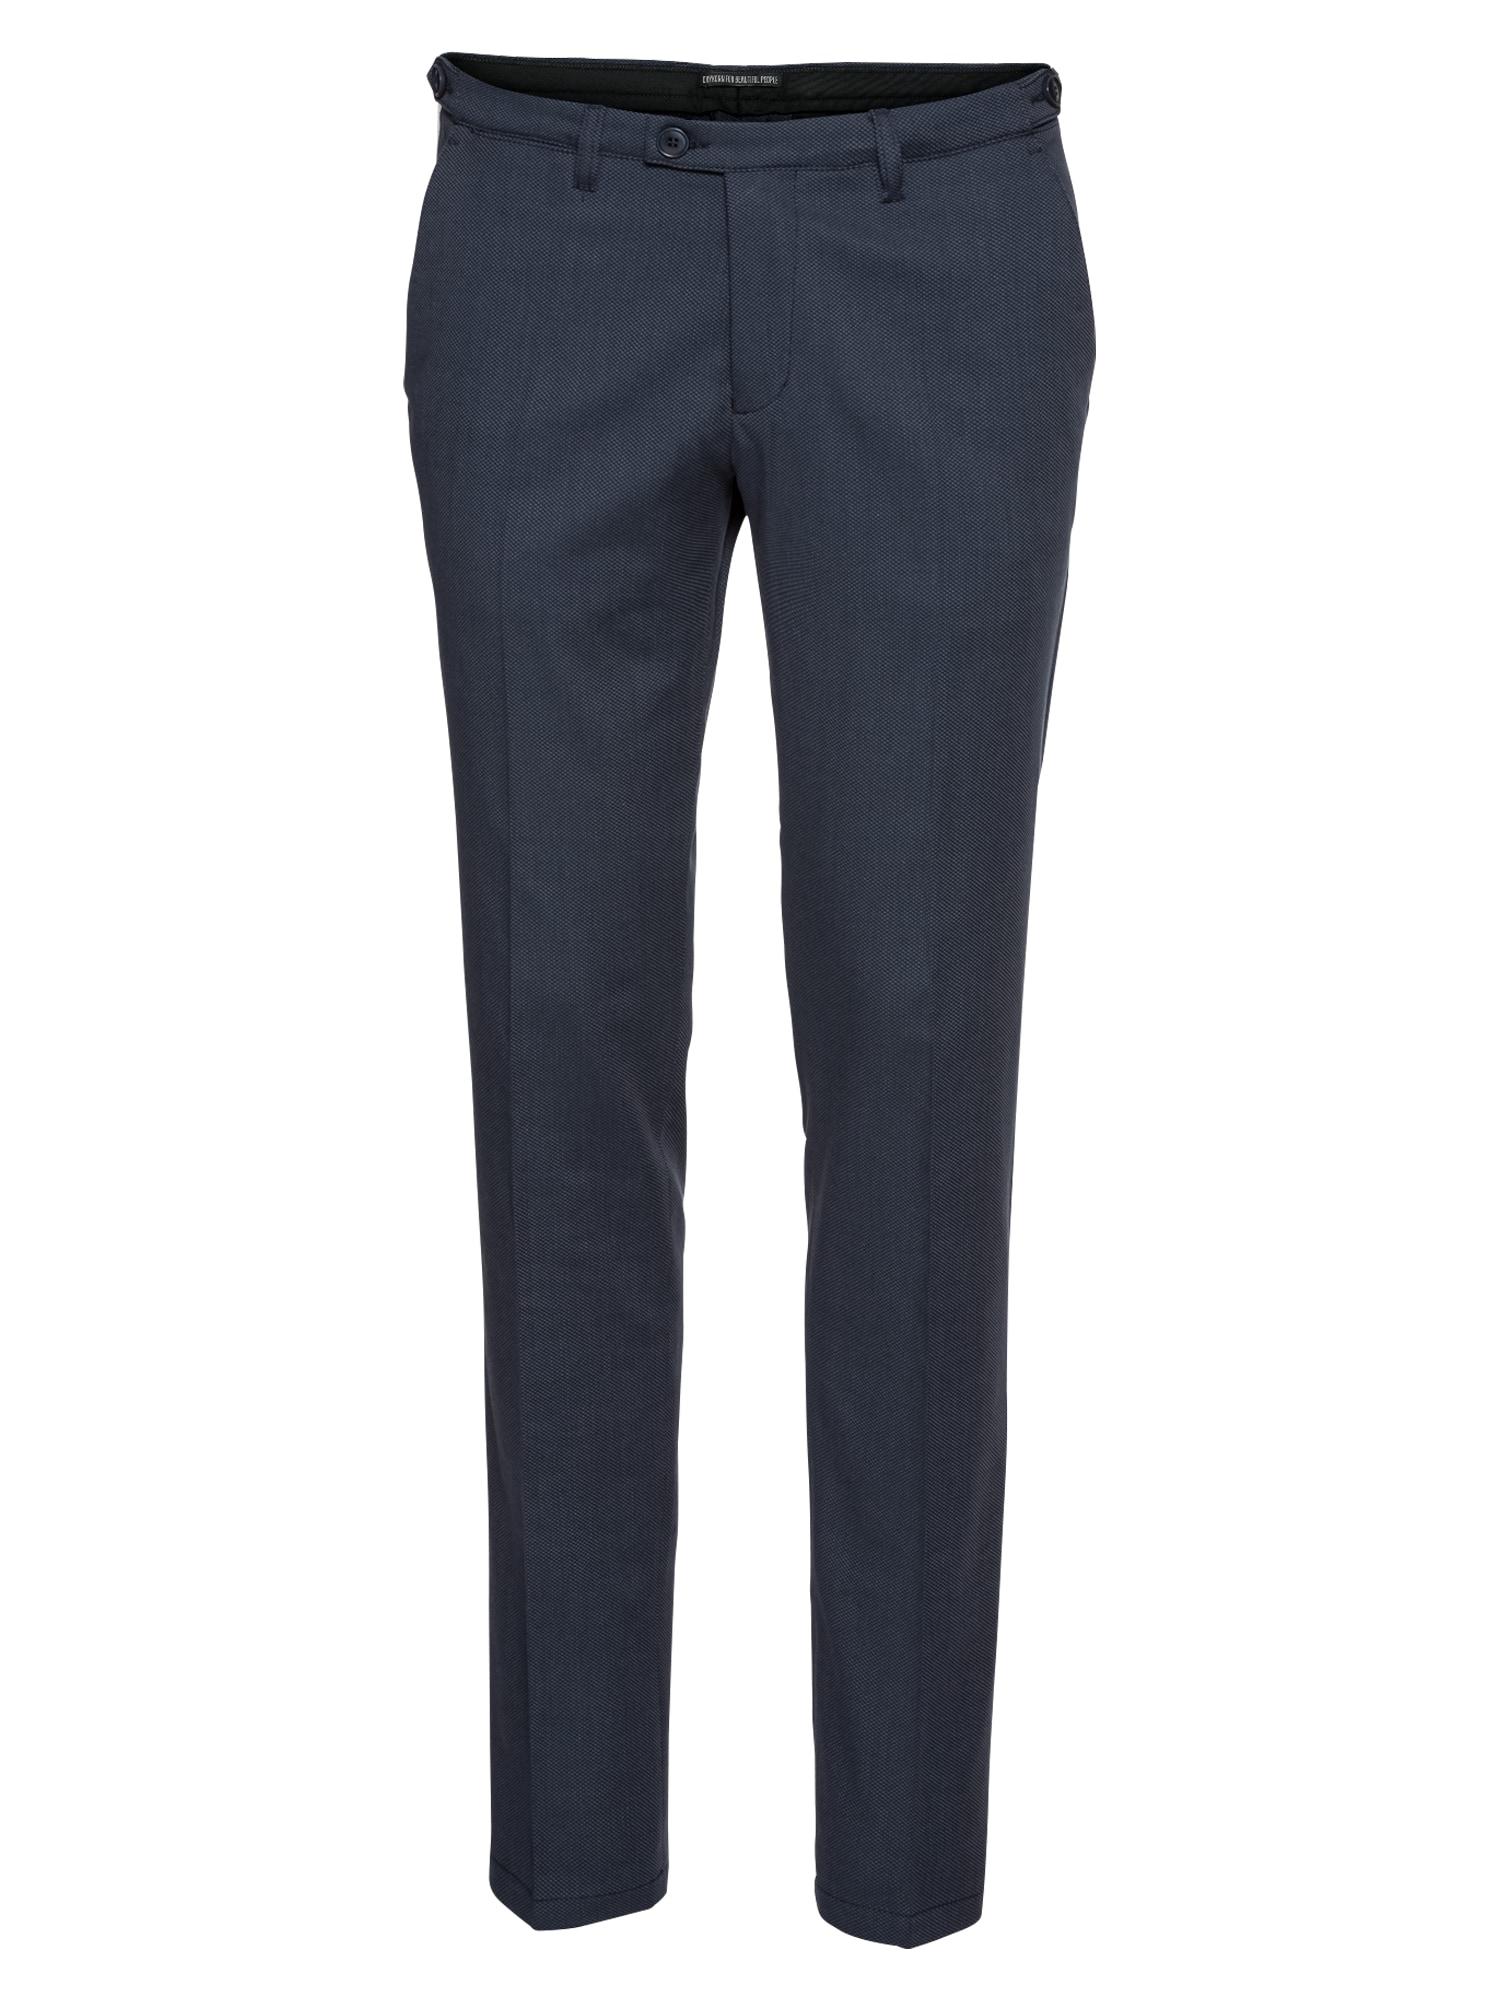 Kalhoty s puky KILL modrá DRYKORN